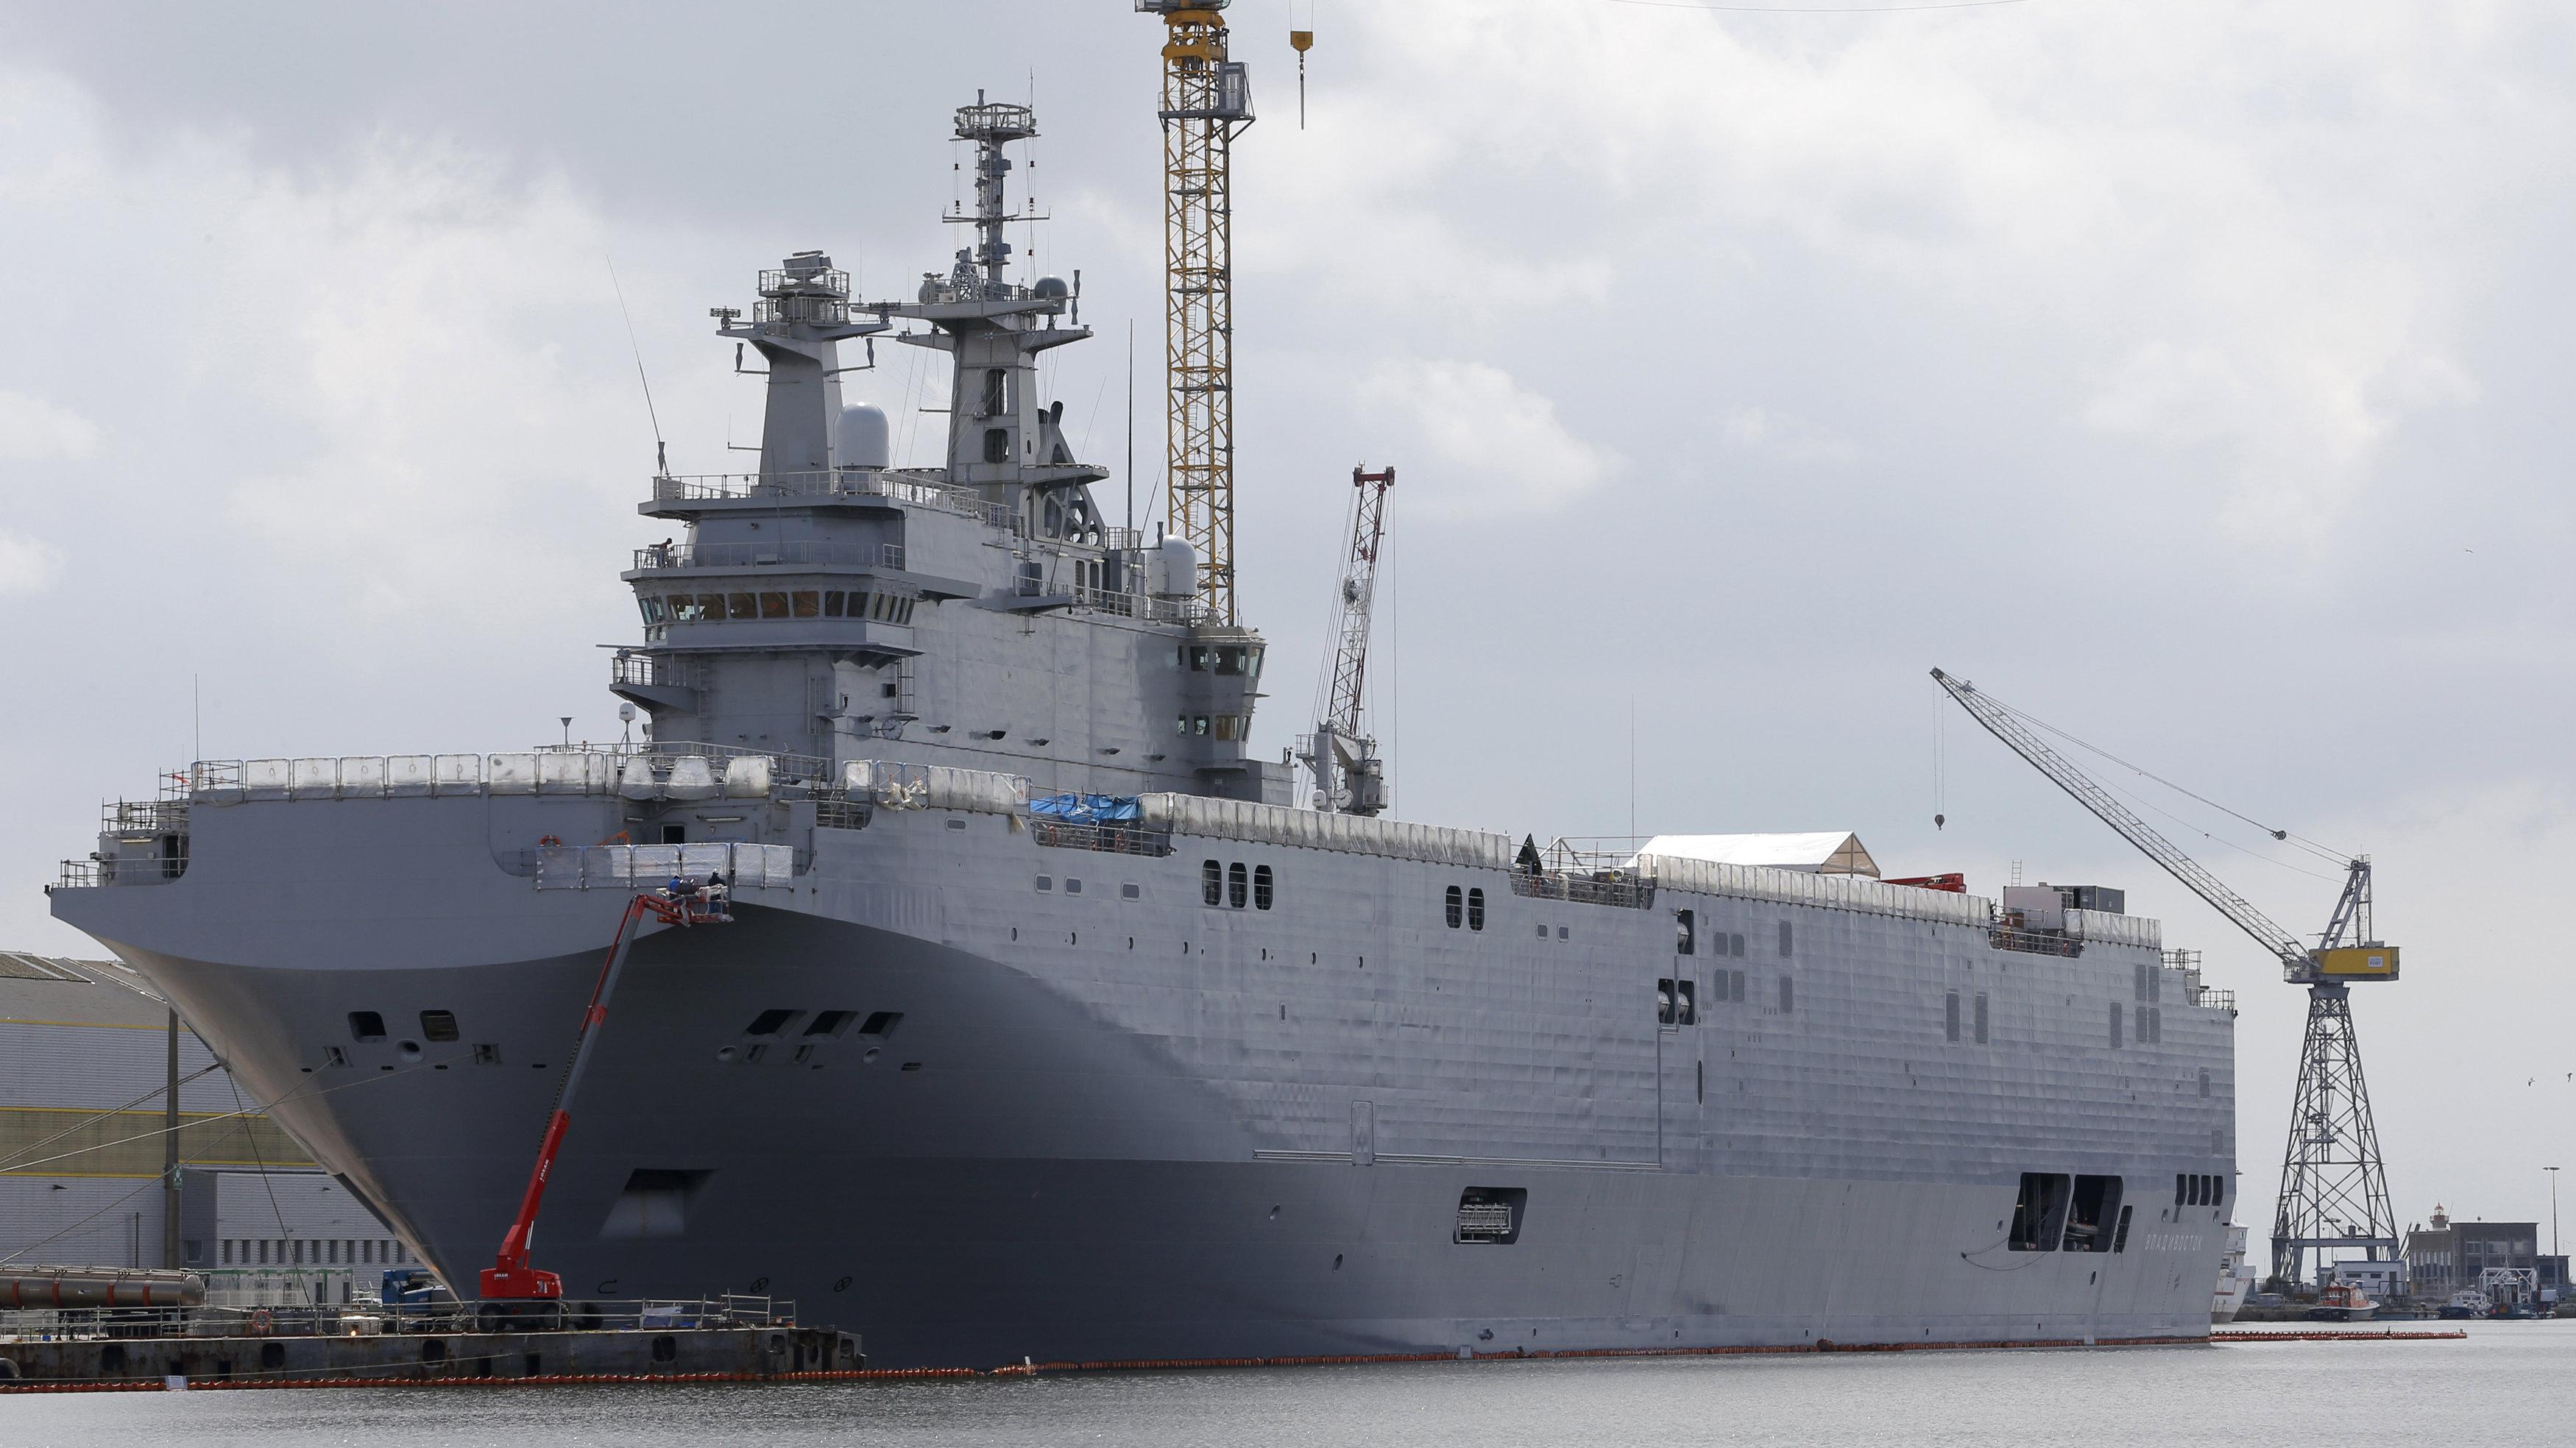 The Mistral-class helicopter carrier Vladivostok is seen at the STX Les Chantiers de l'Atlantique shipyard site in Saint-Nazaire, western France.